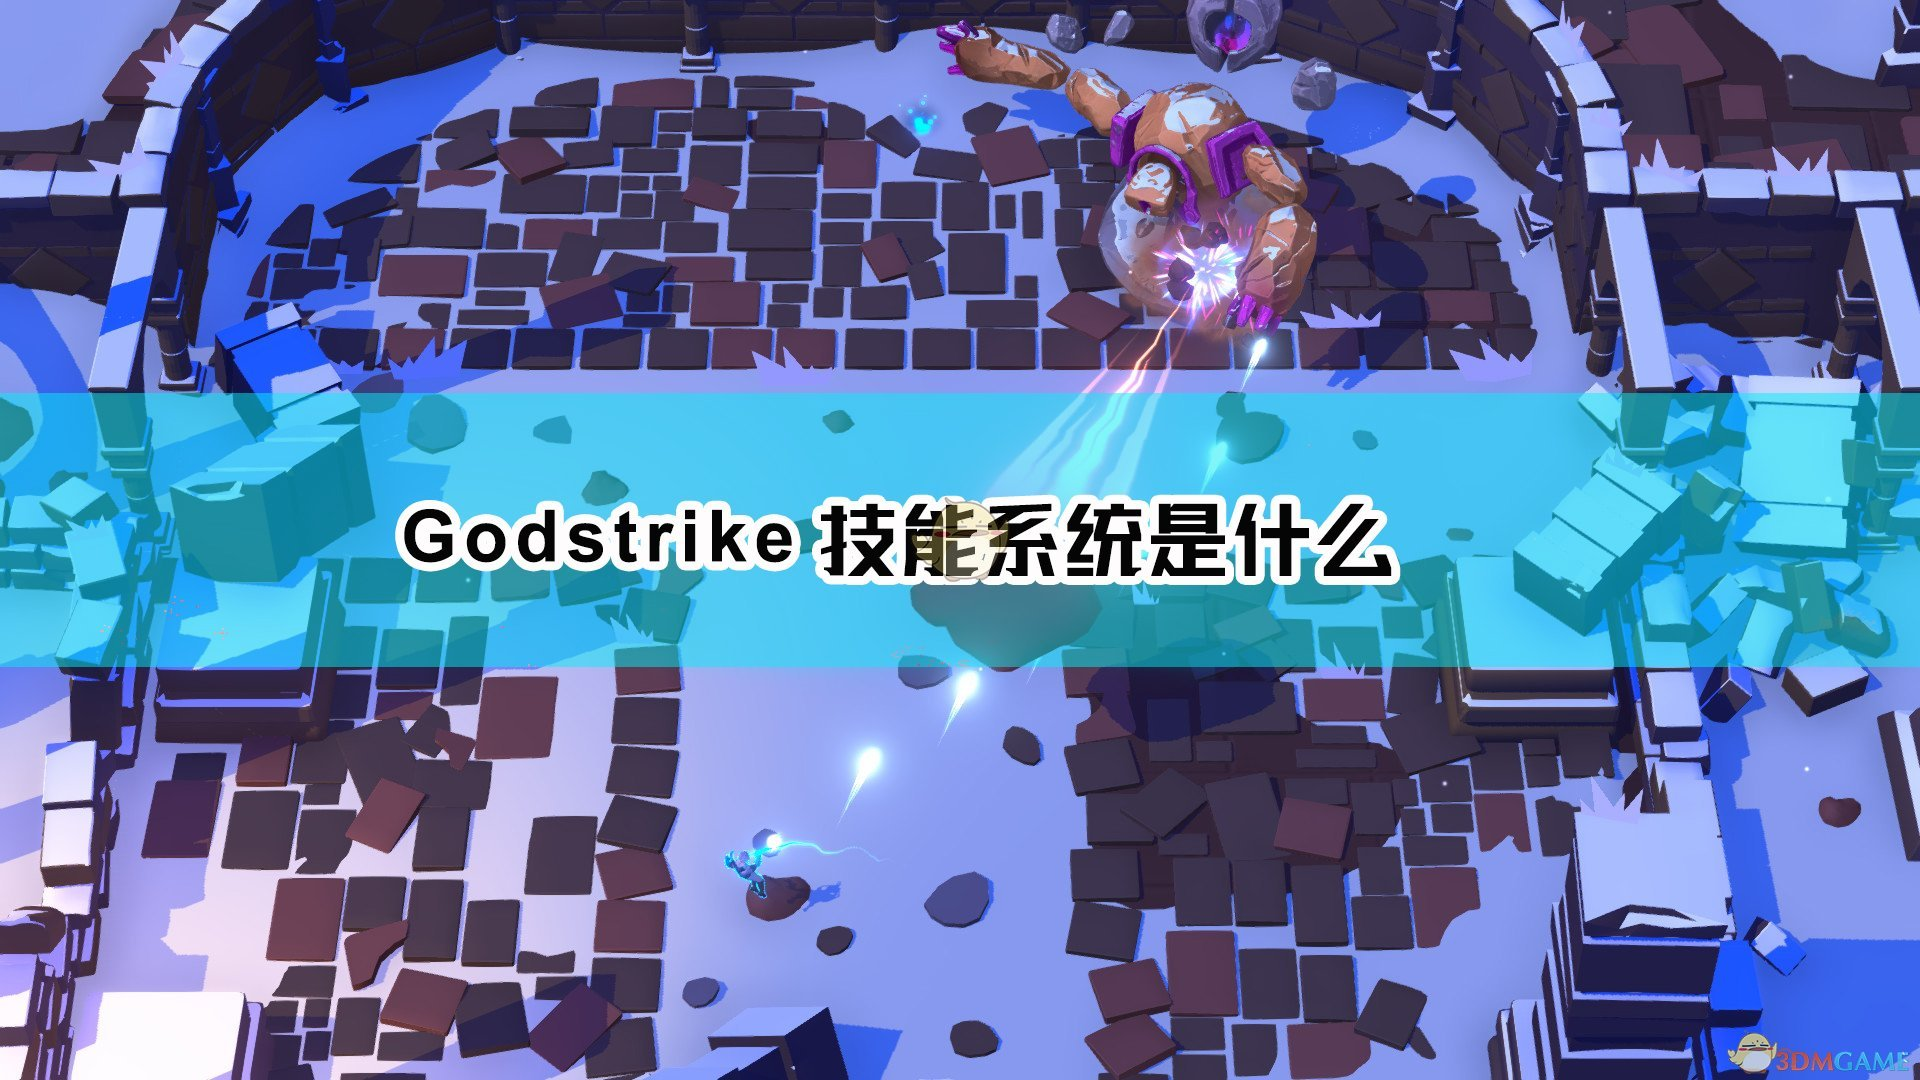 《Godstrike》技能系统简单介绍